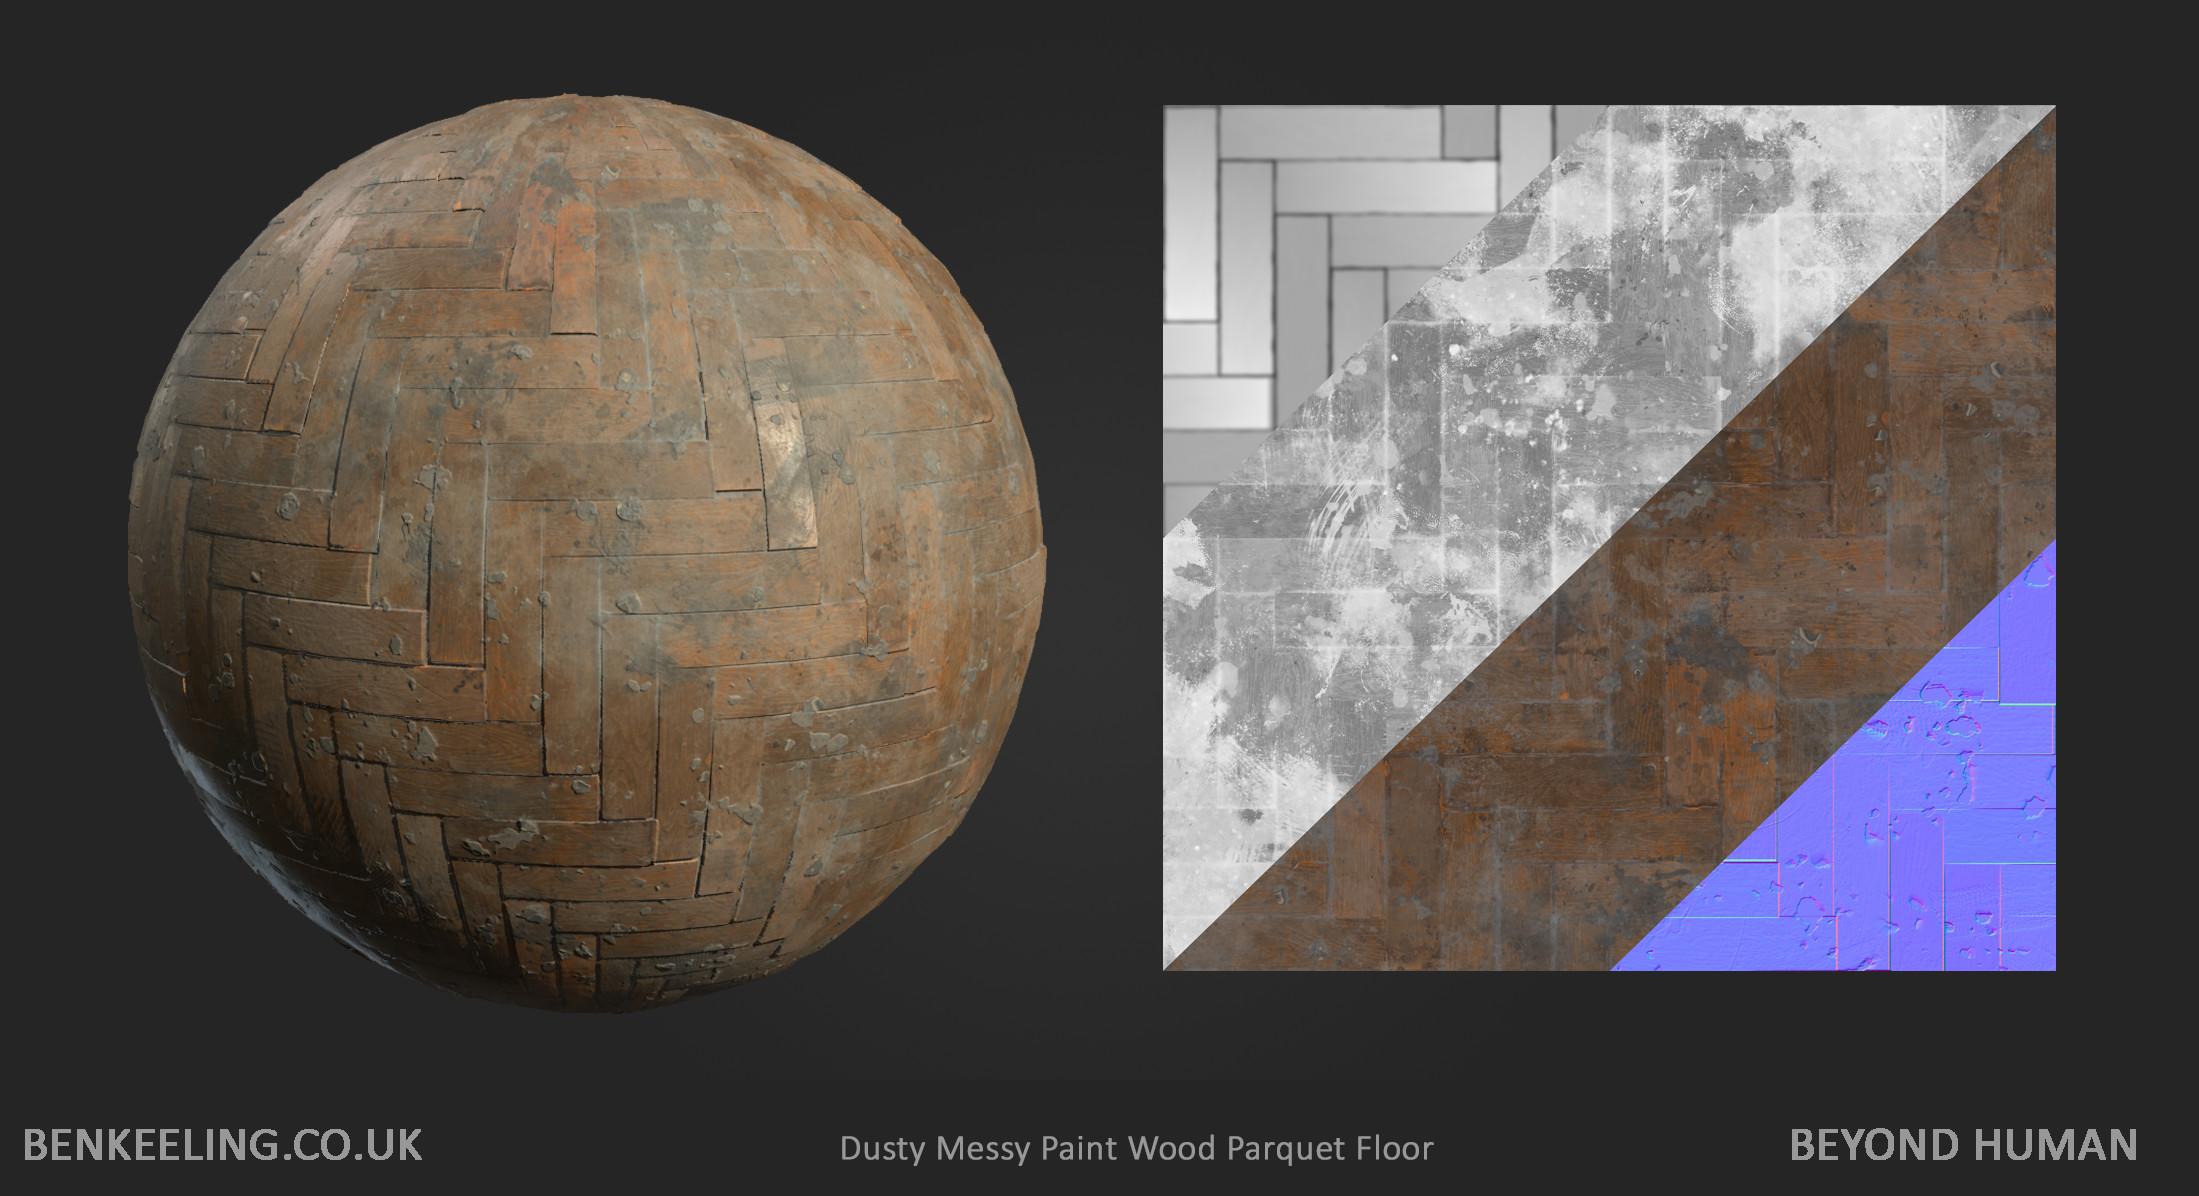 Materials - Dusty Messy Parquet Floor